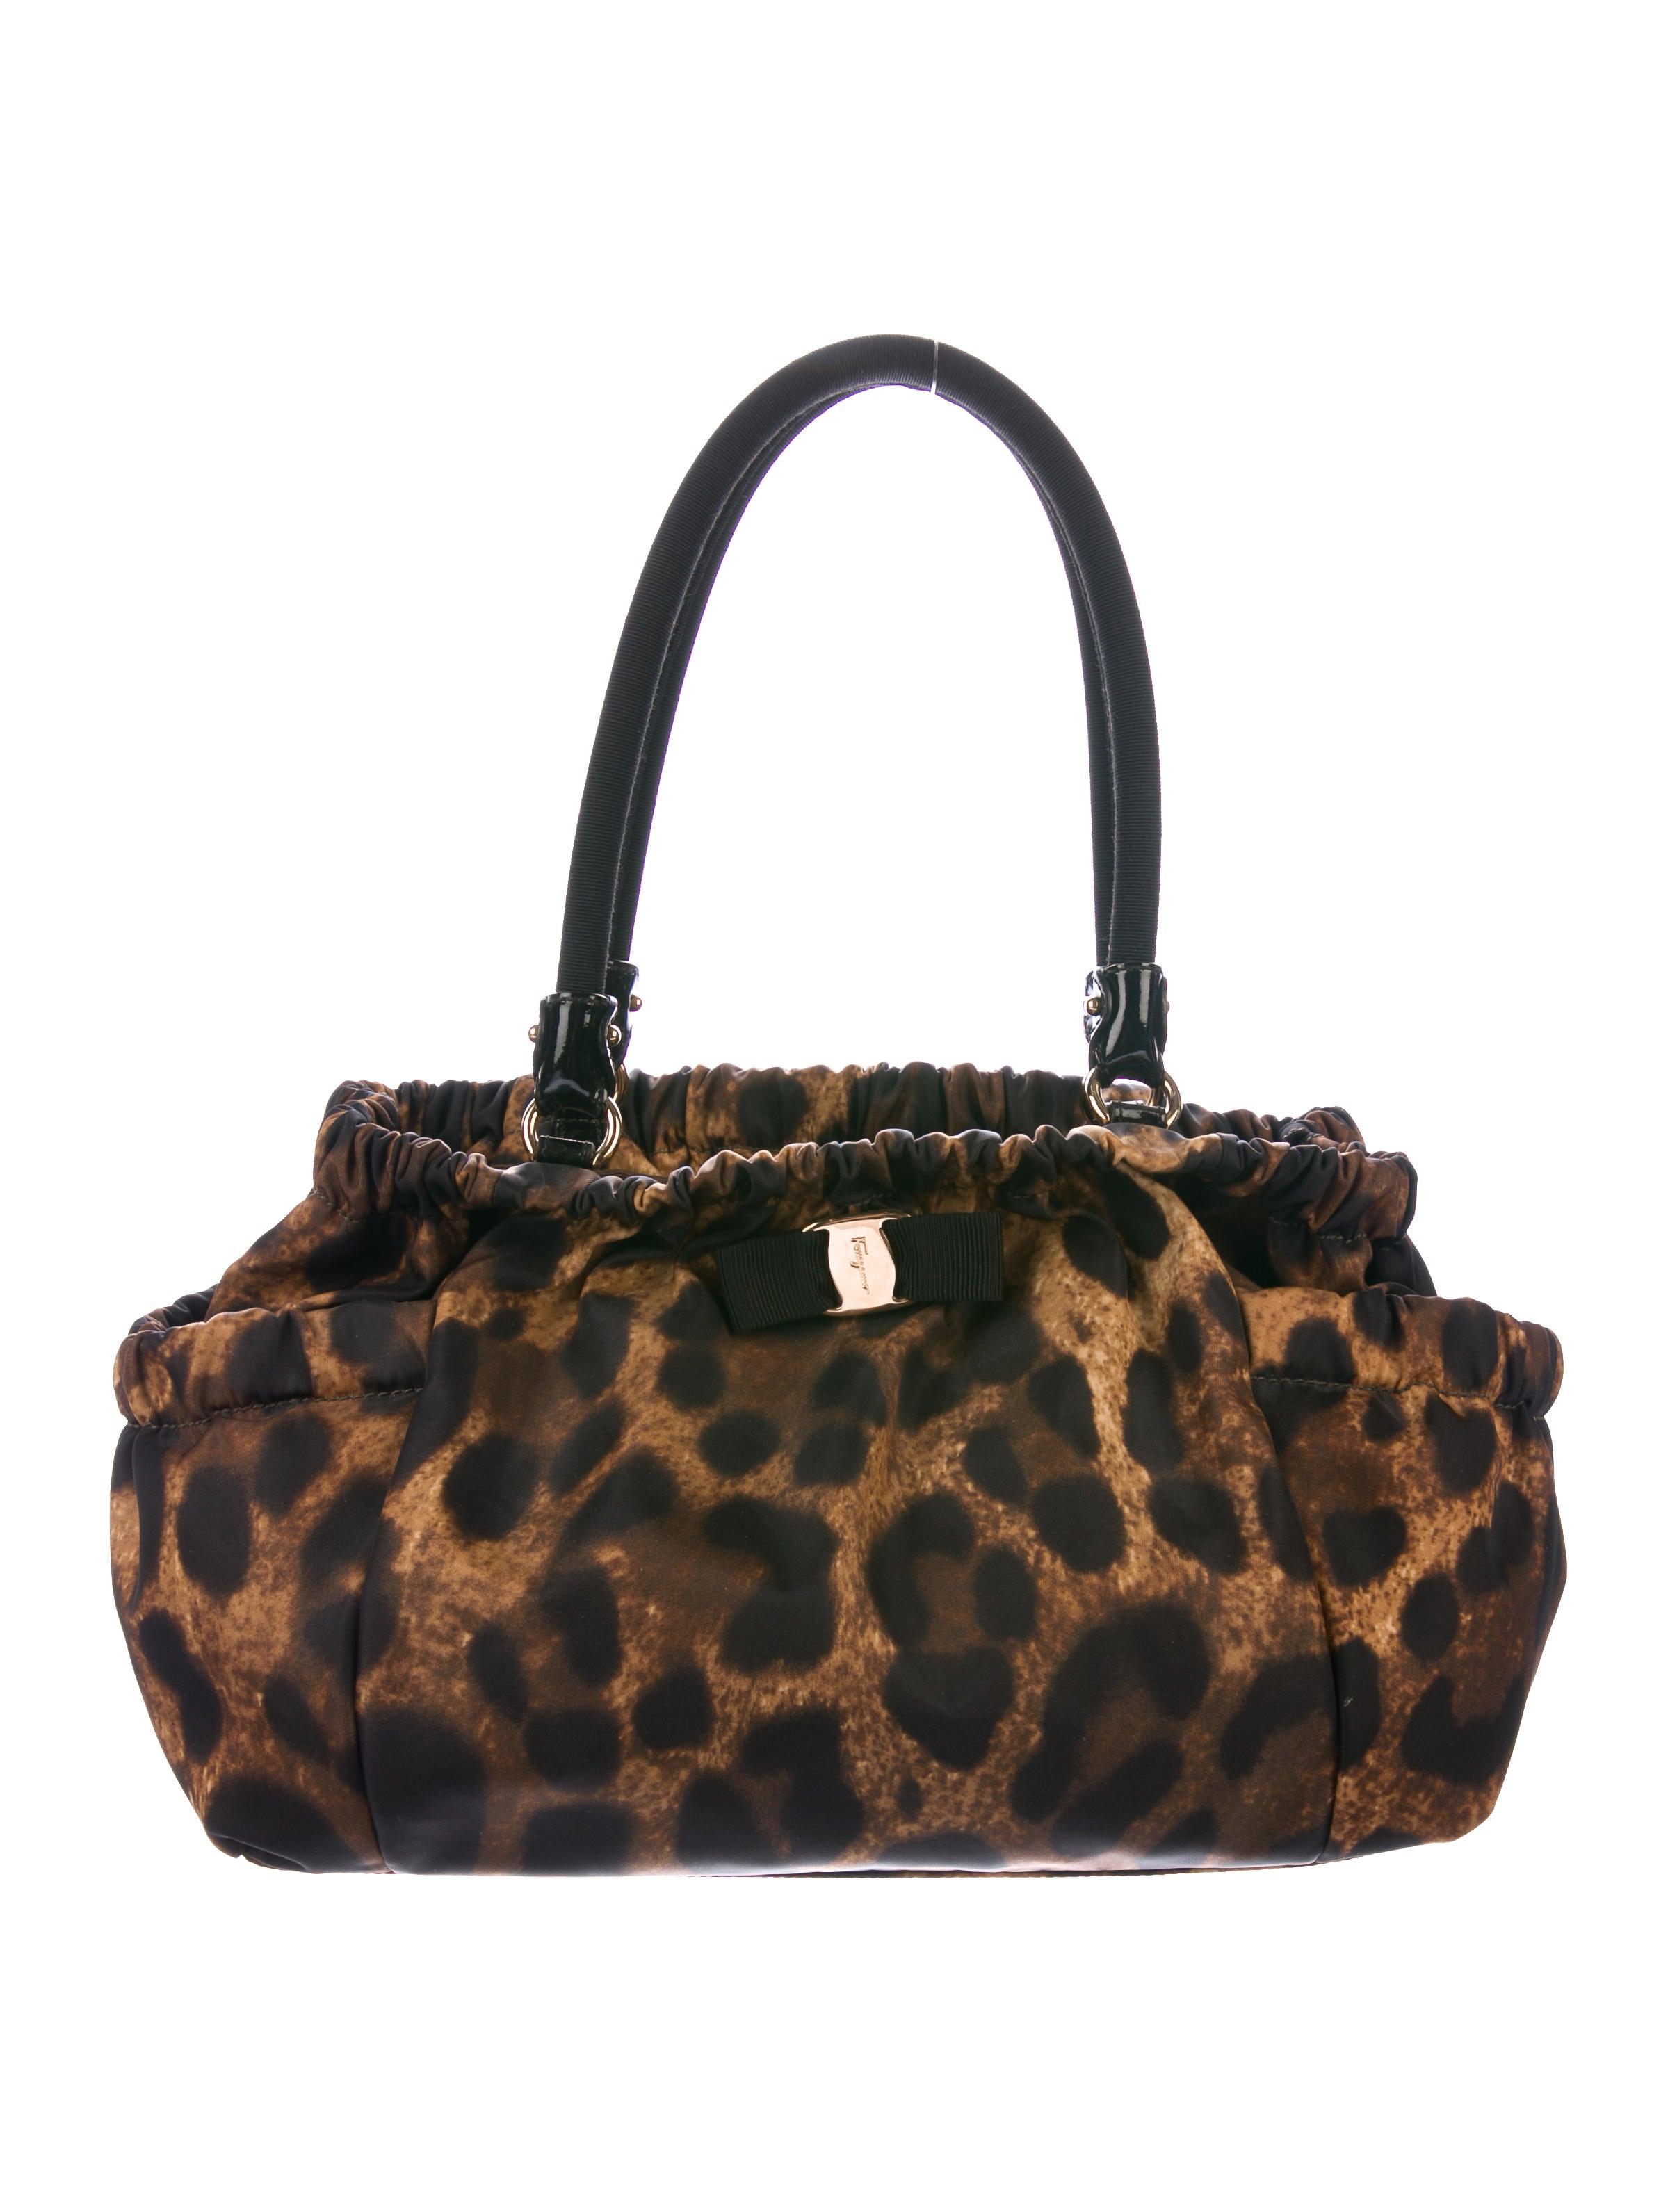 34612cee376a Nylon Leopard Print Bag Shoulder Ferragamo Salvatore wft5gg ...